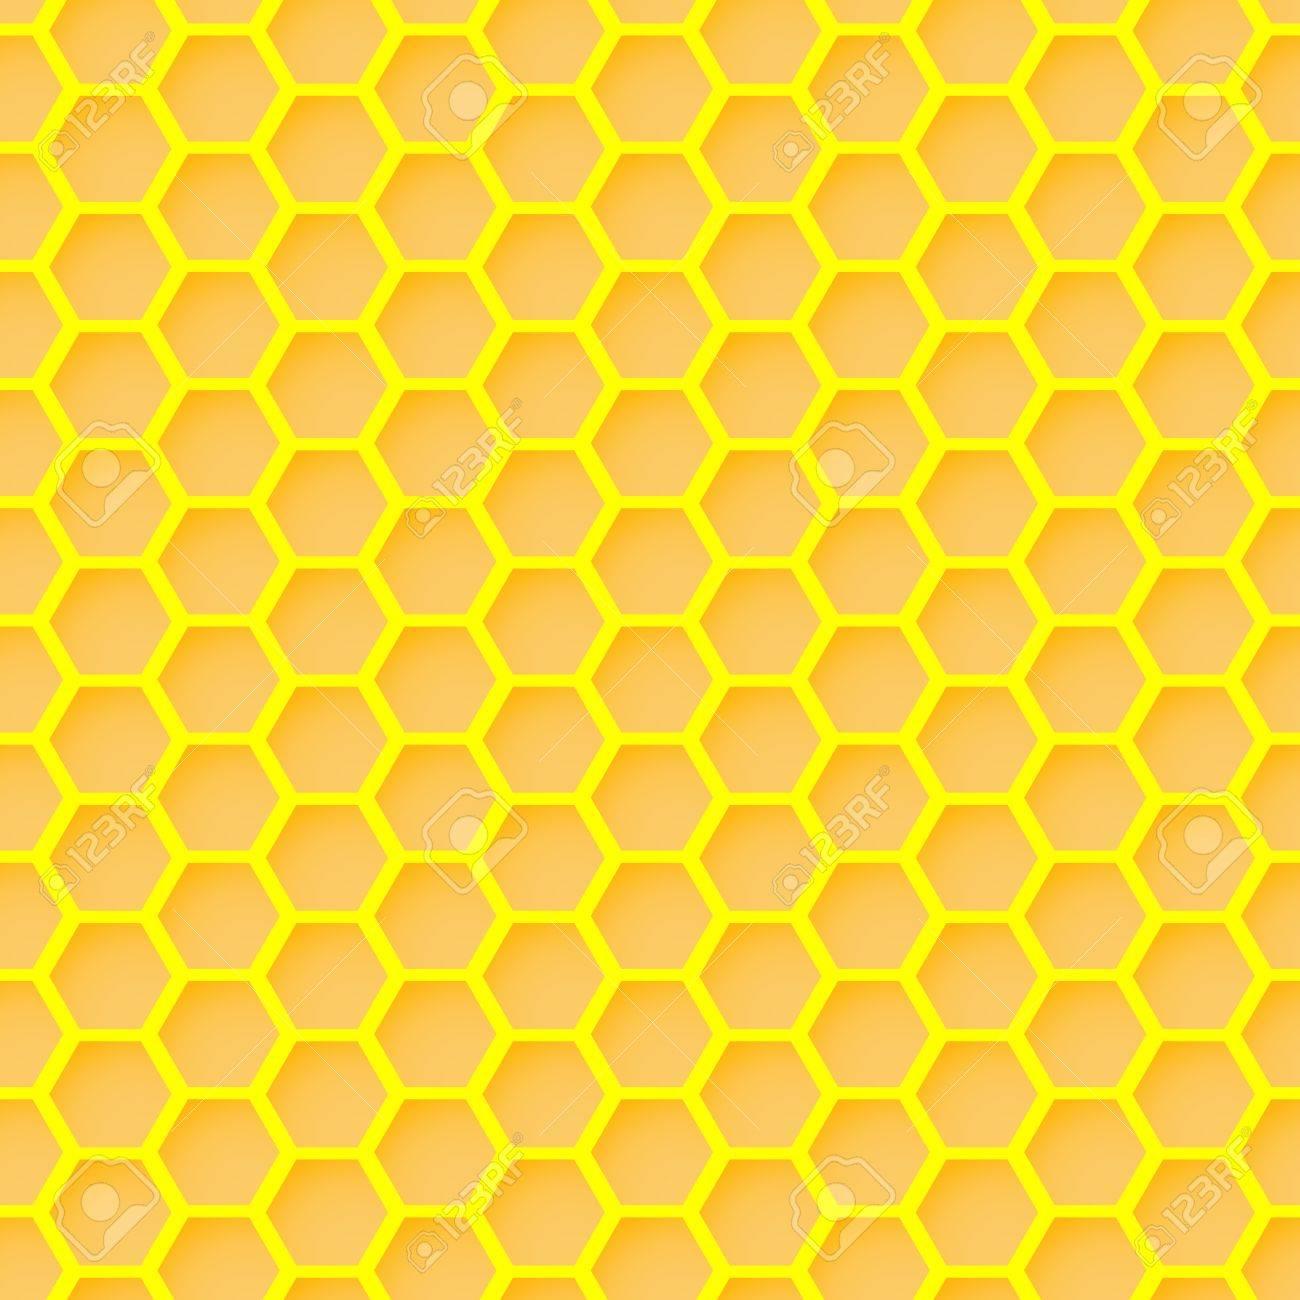 Honeycomb Seamless Wallpaper Stock Vector